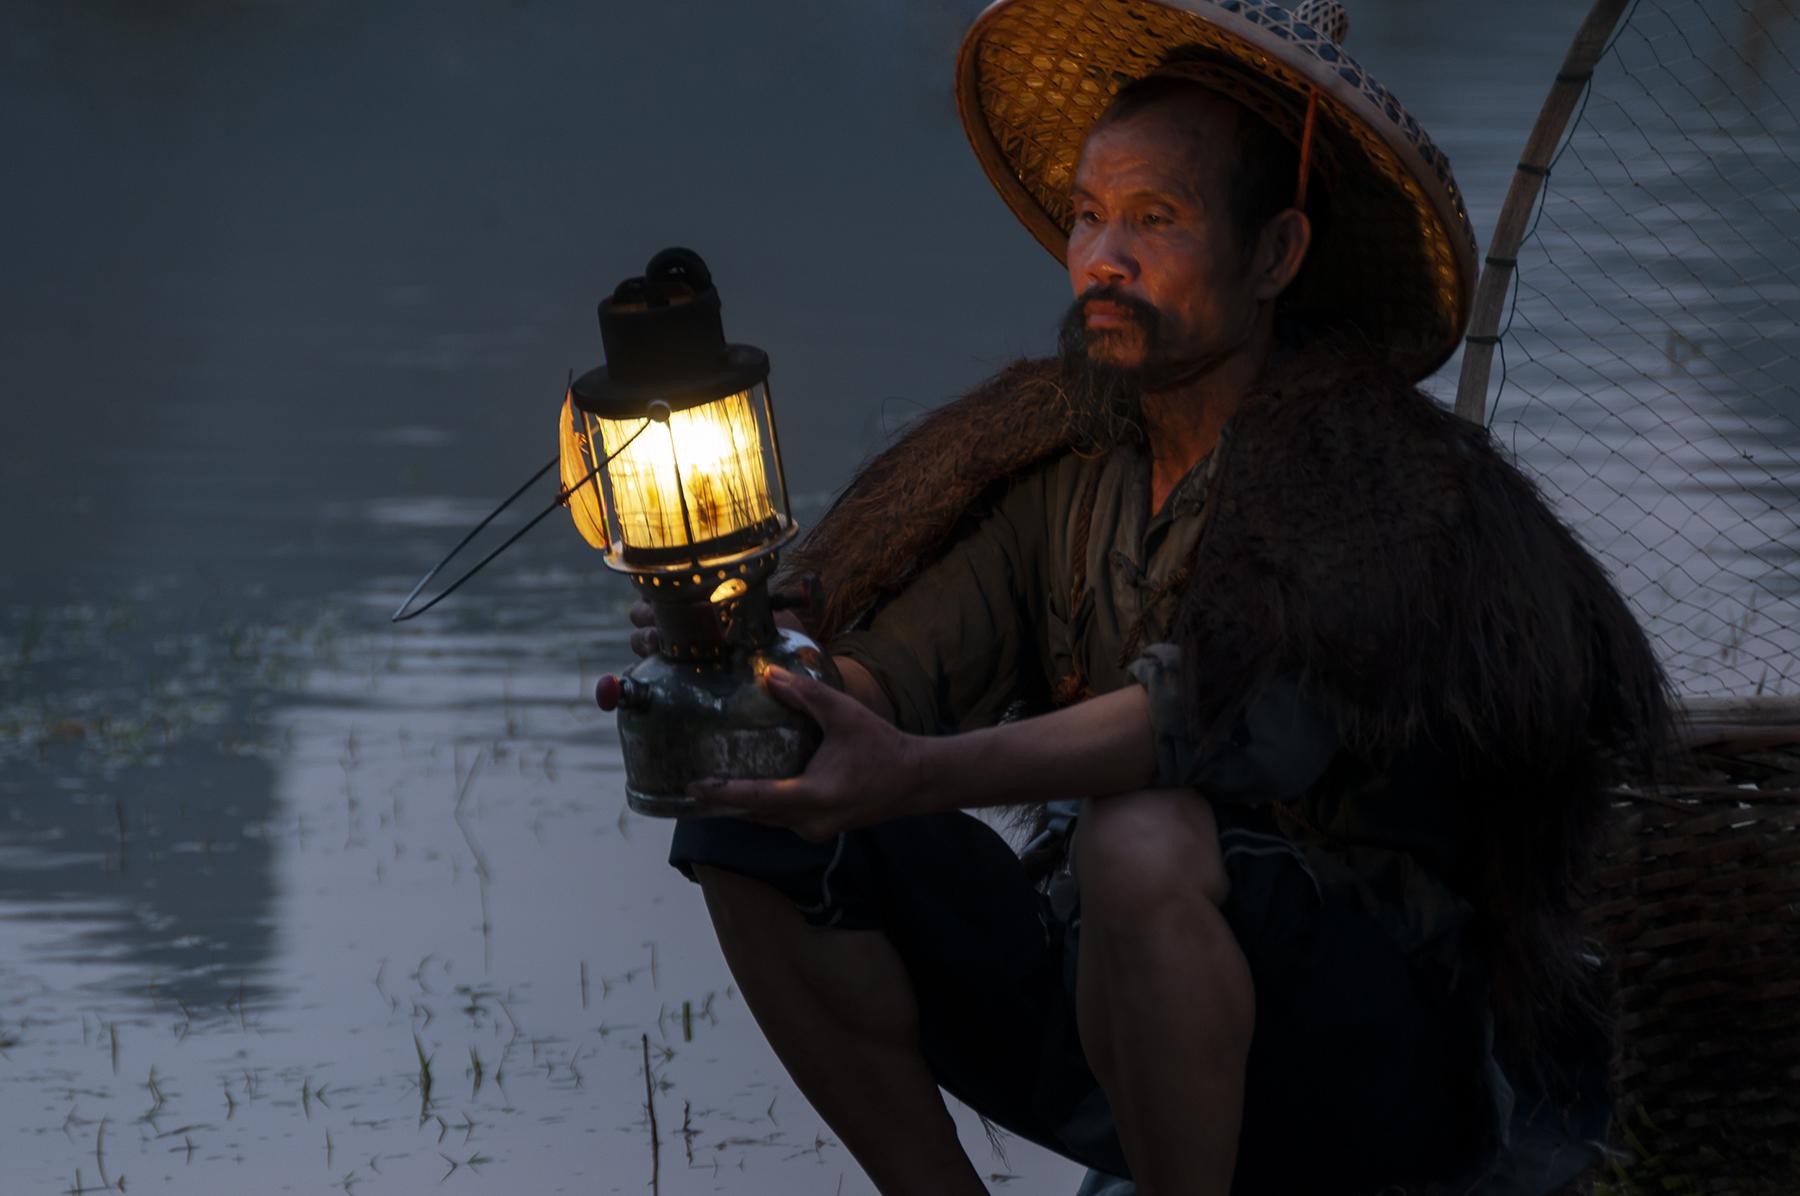 Marlene_Miyamoto_Dying Arts_Cormorant Fisherman 4_4.jpg